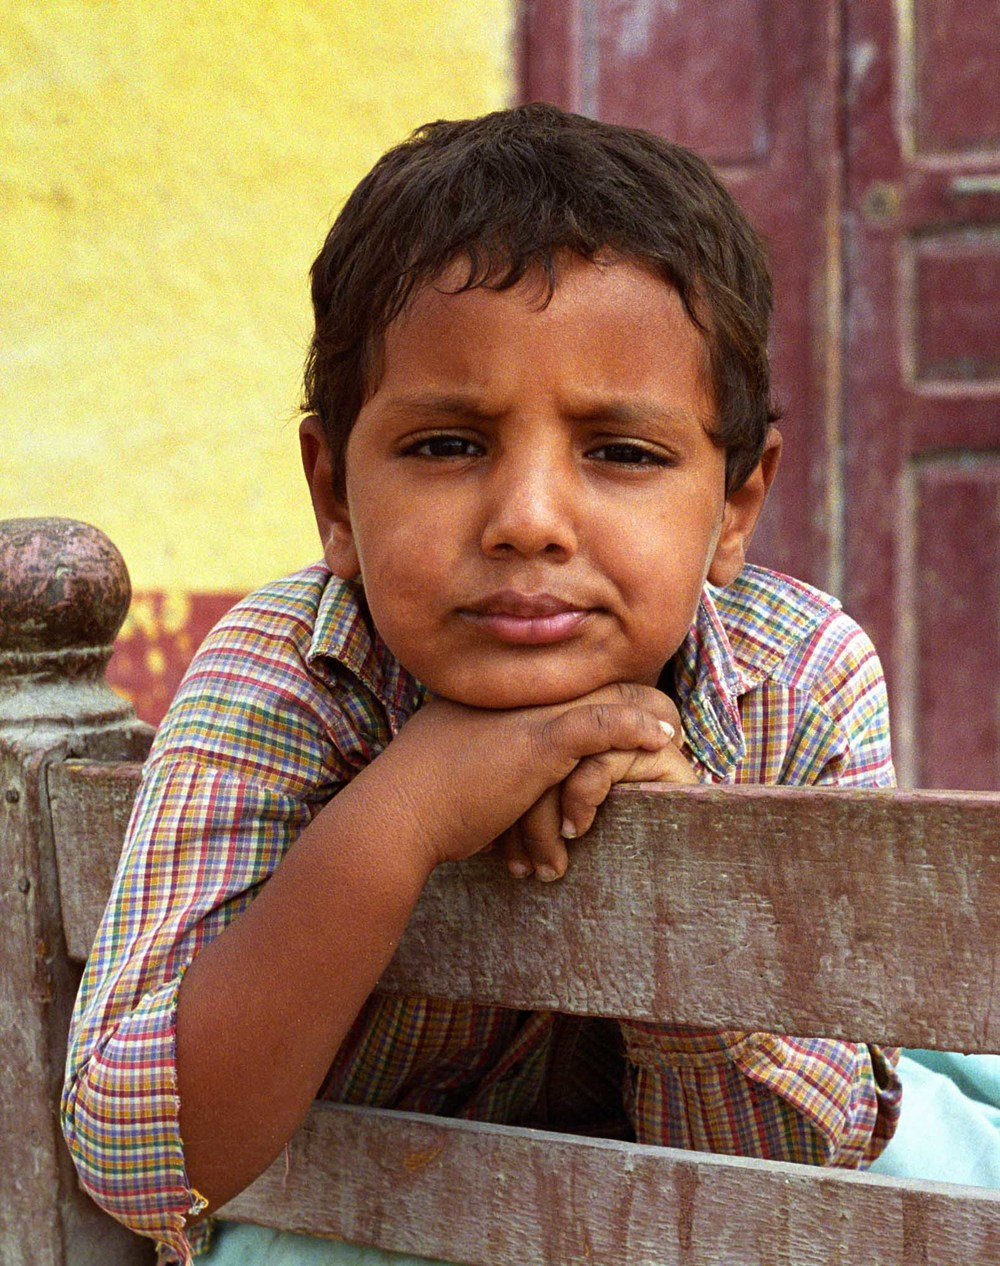 Boy at Nubian village, Egypt